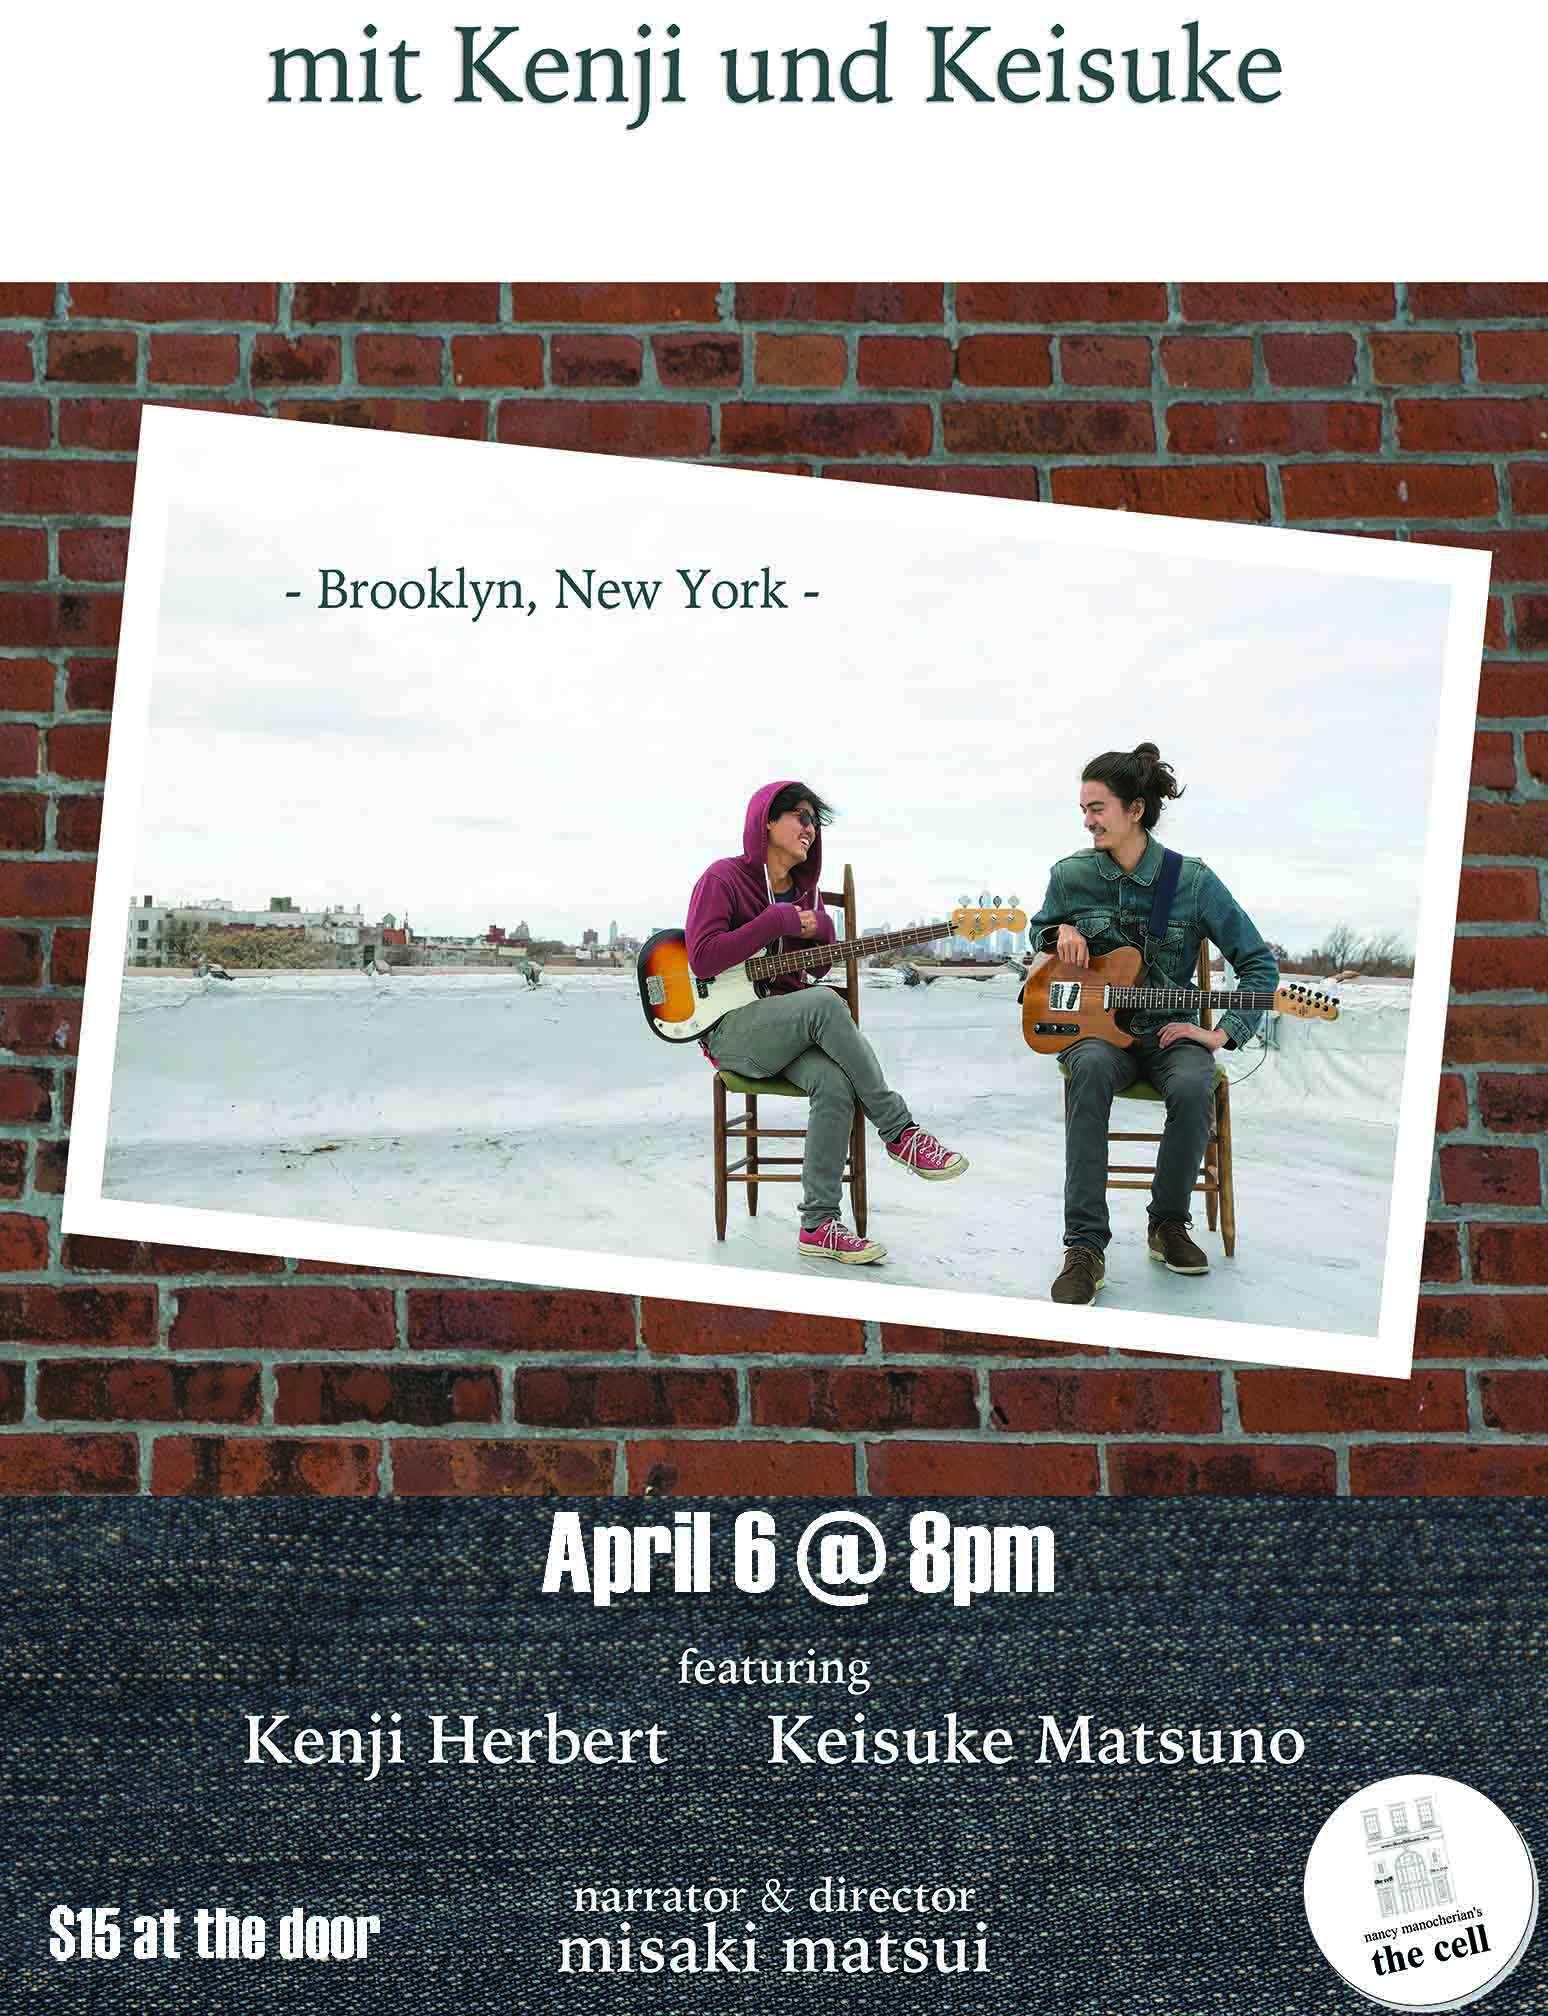 "- documentary film screening ""mit Kenji und Keisuke"" - music live by Kenji & Keisuke - talk show   General admission: $15"